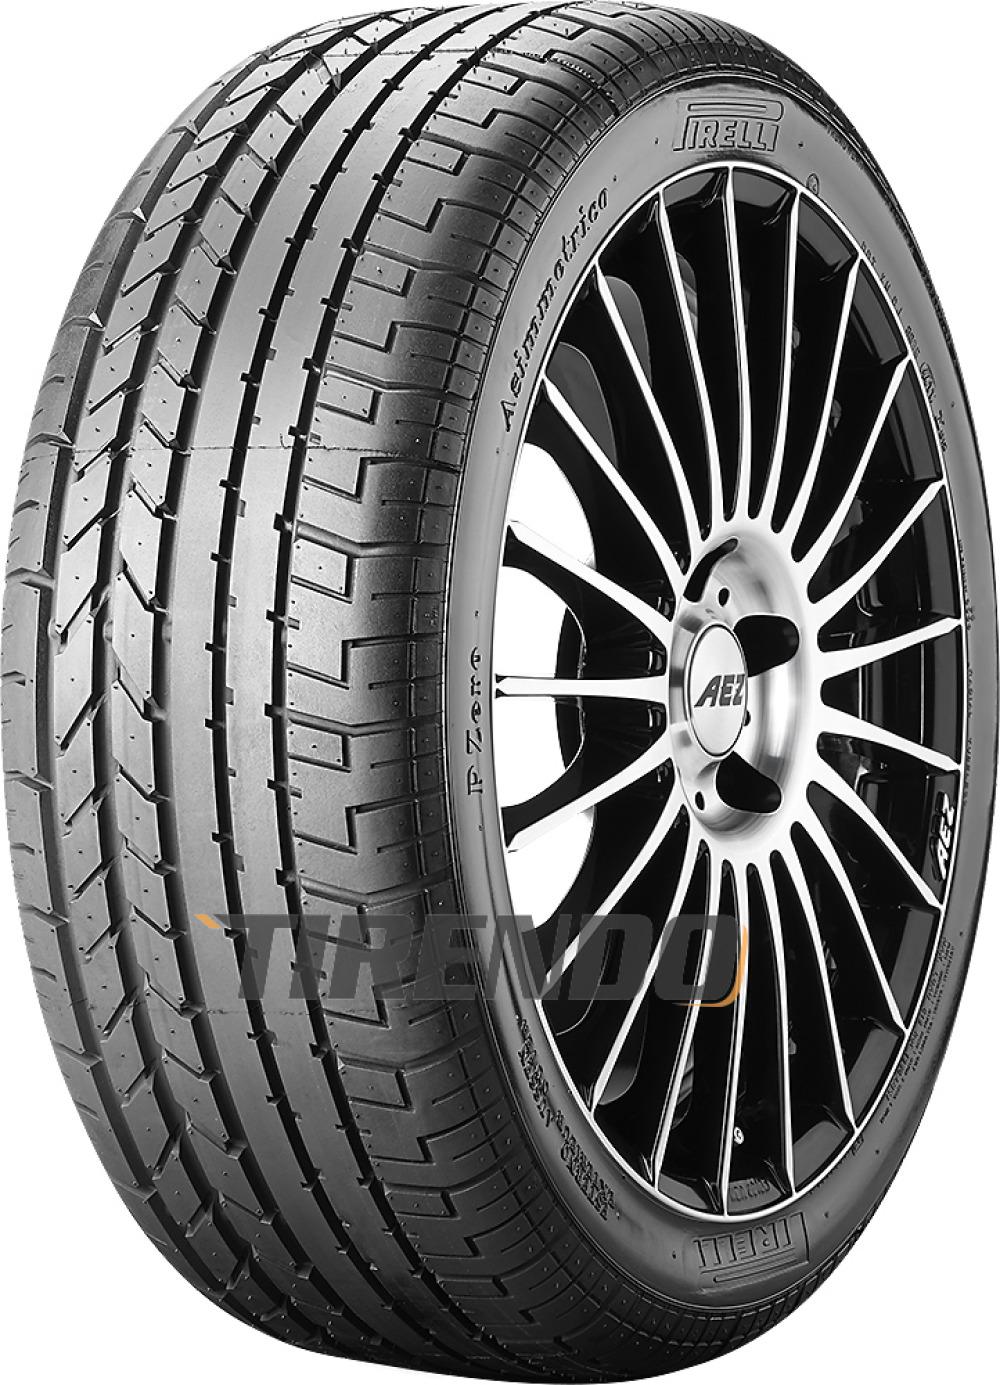 Pirelli P Zero Asimmetrico ( 285/40 ZR17 (100Y) )